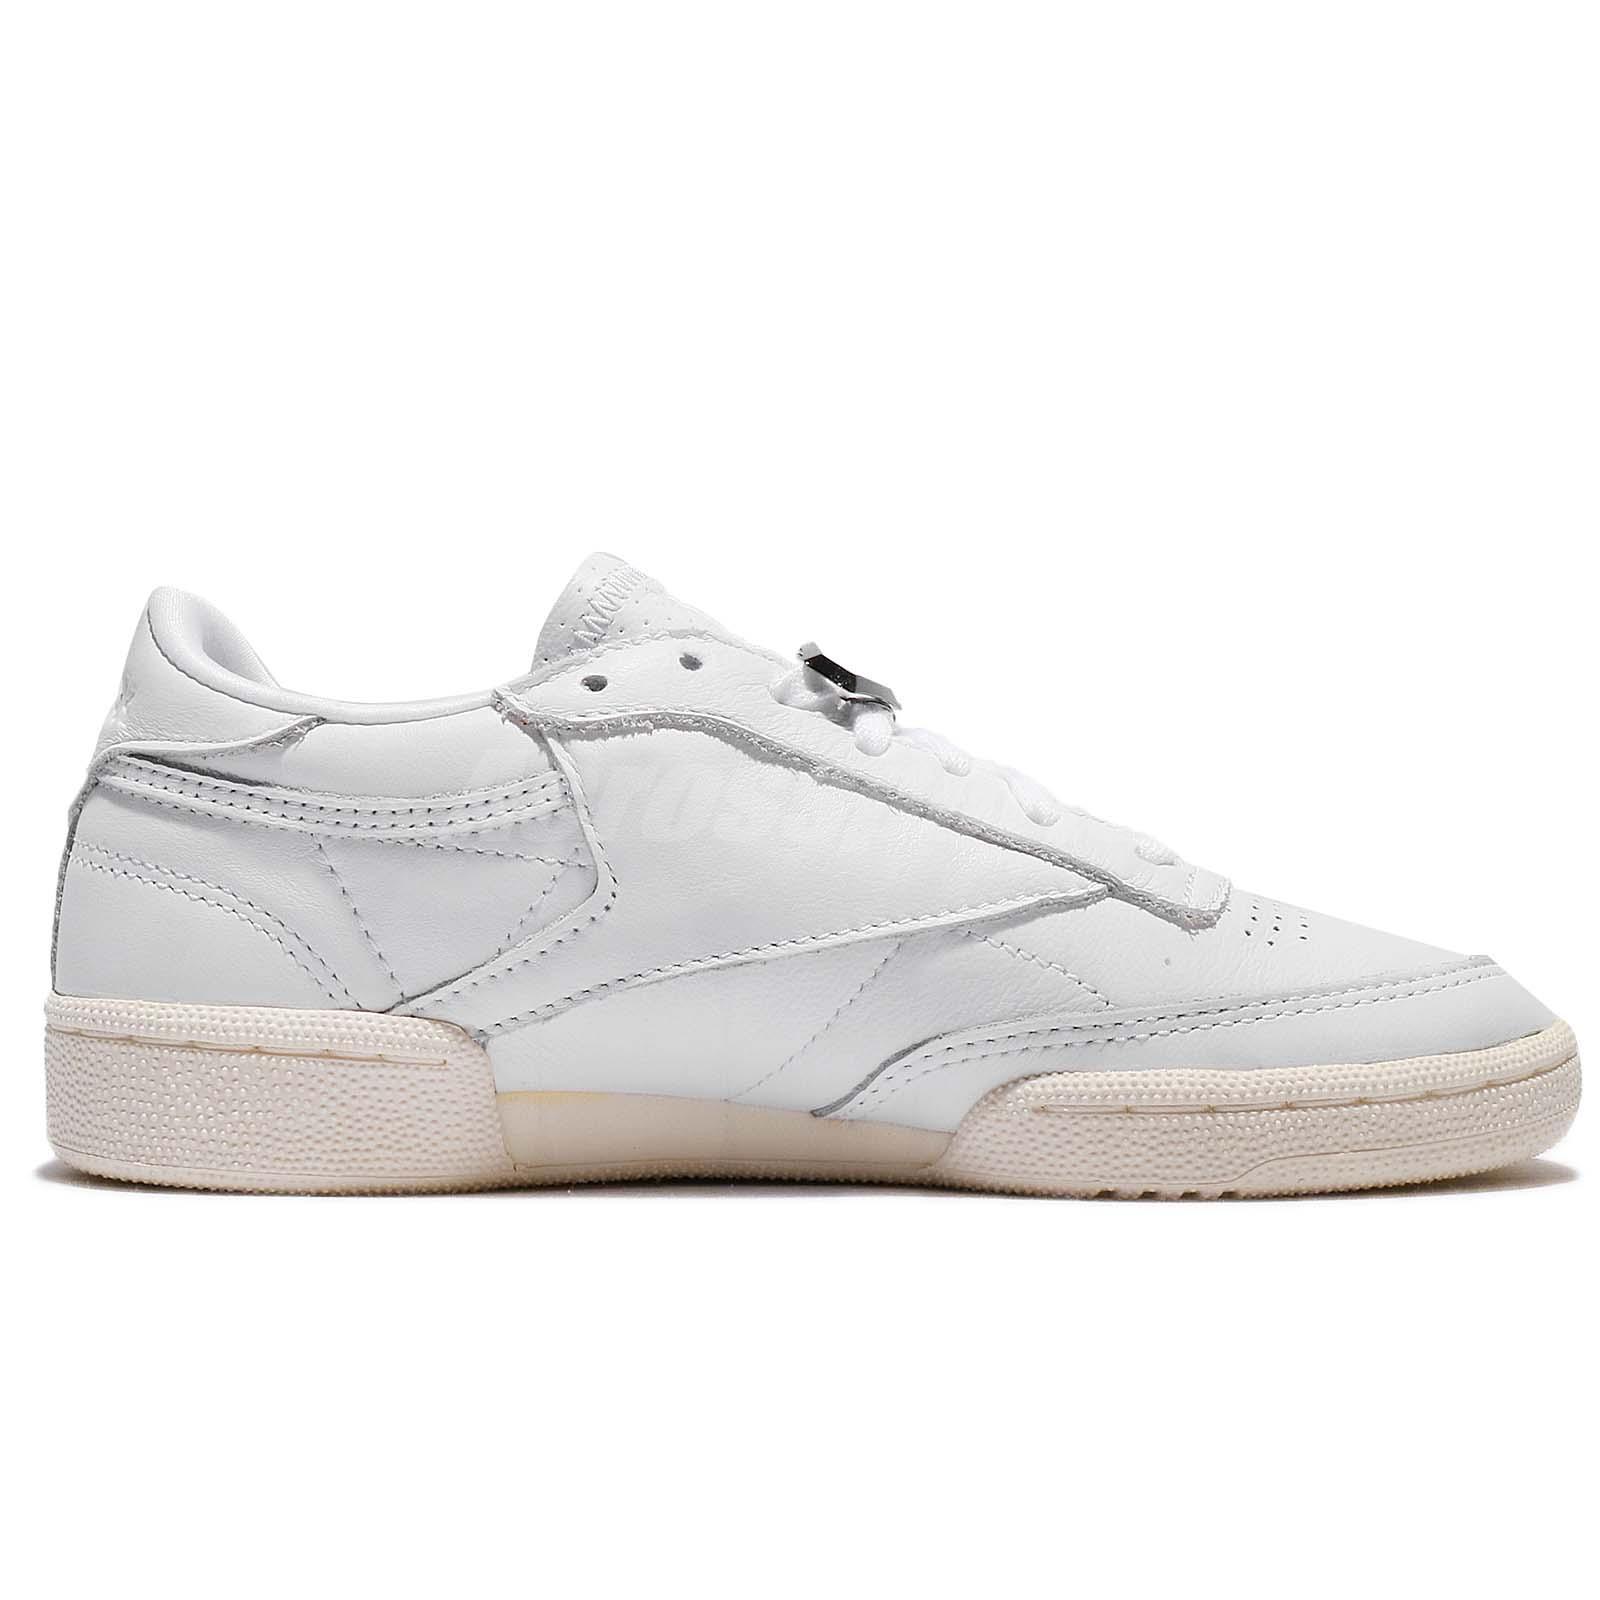 b81408ffe9a Reebok Club C 85 Hardware White Chalk Women Shoes Sneakers Trainers ...